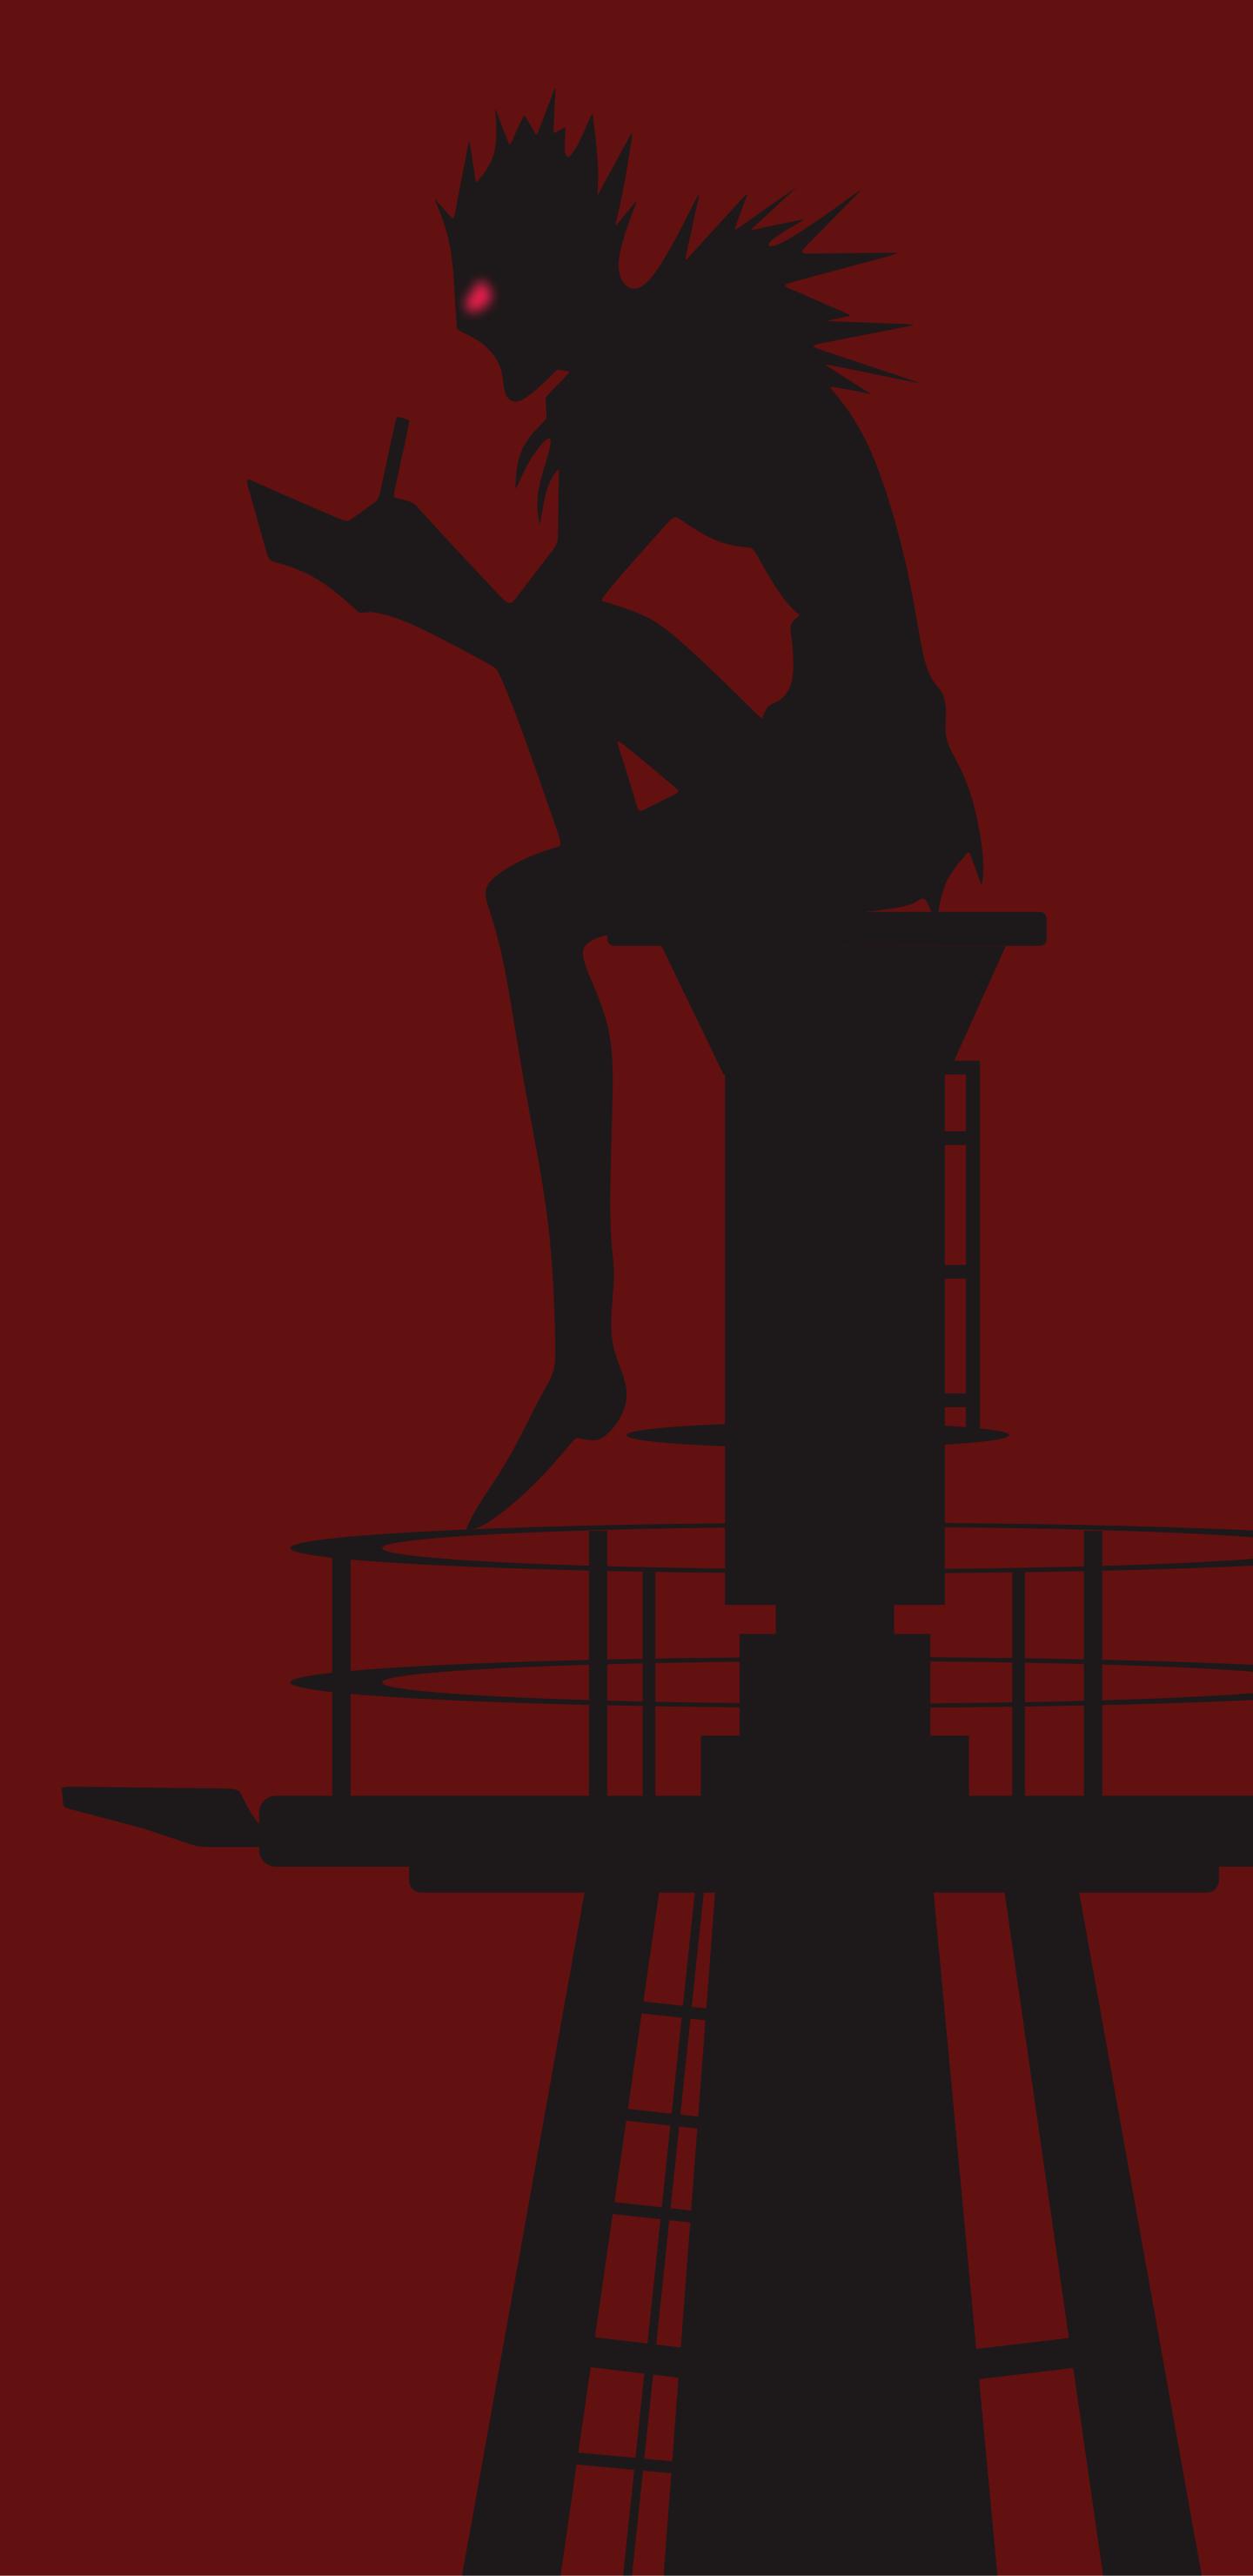 Ryuk Anime Death Note Mobile Wallpaper Illustration